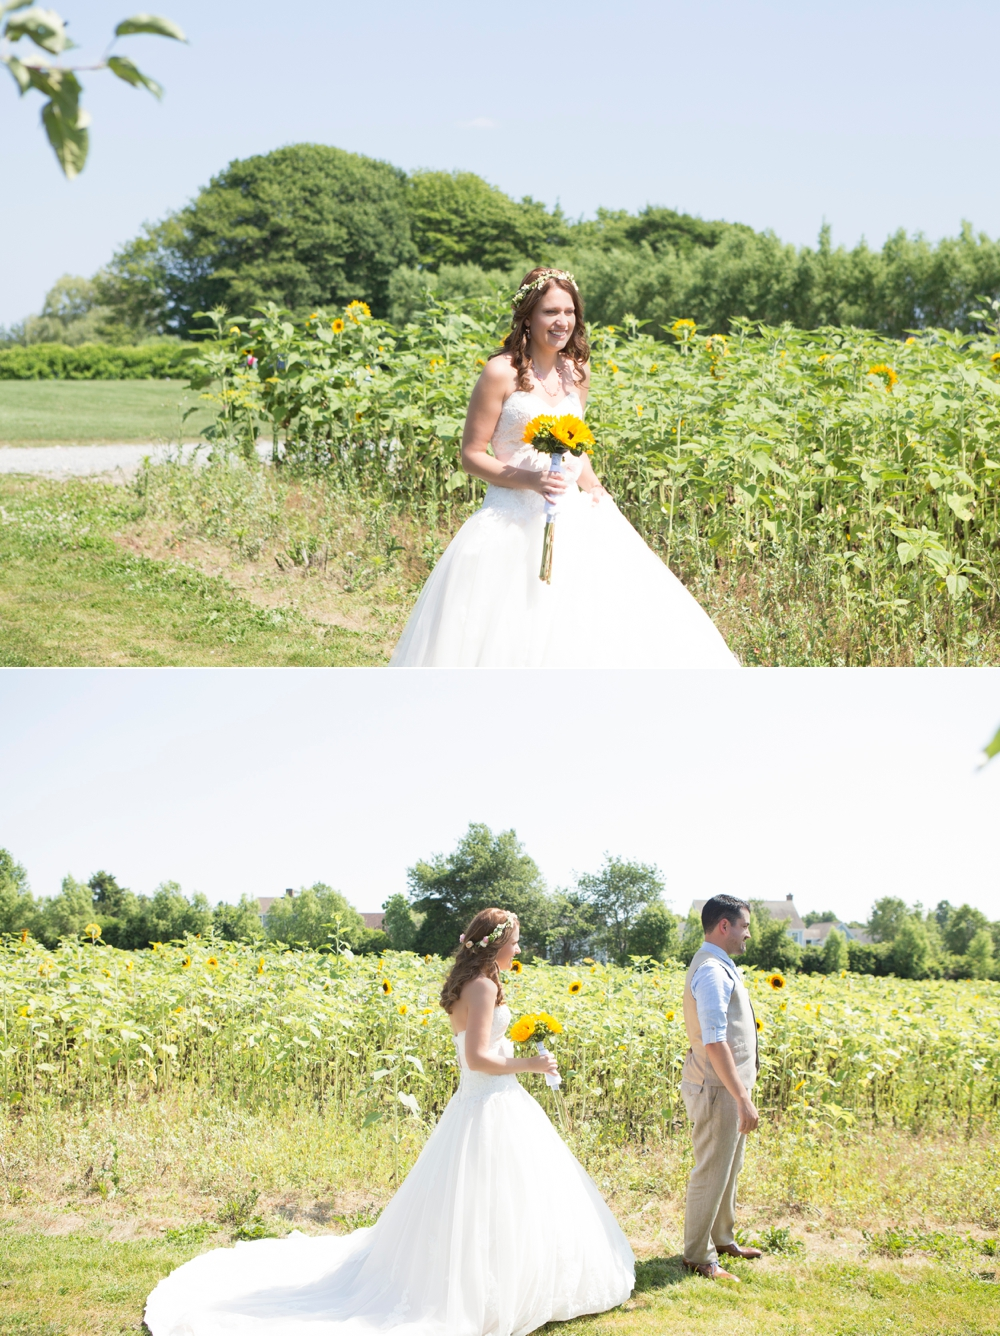 GreenvaleVineyards_Wedding_Missy&Joe_0008.jpg